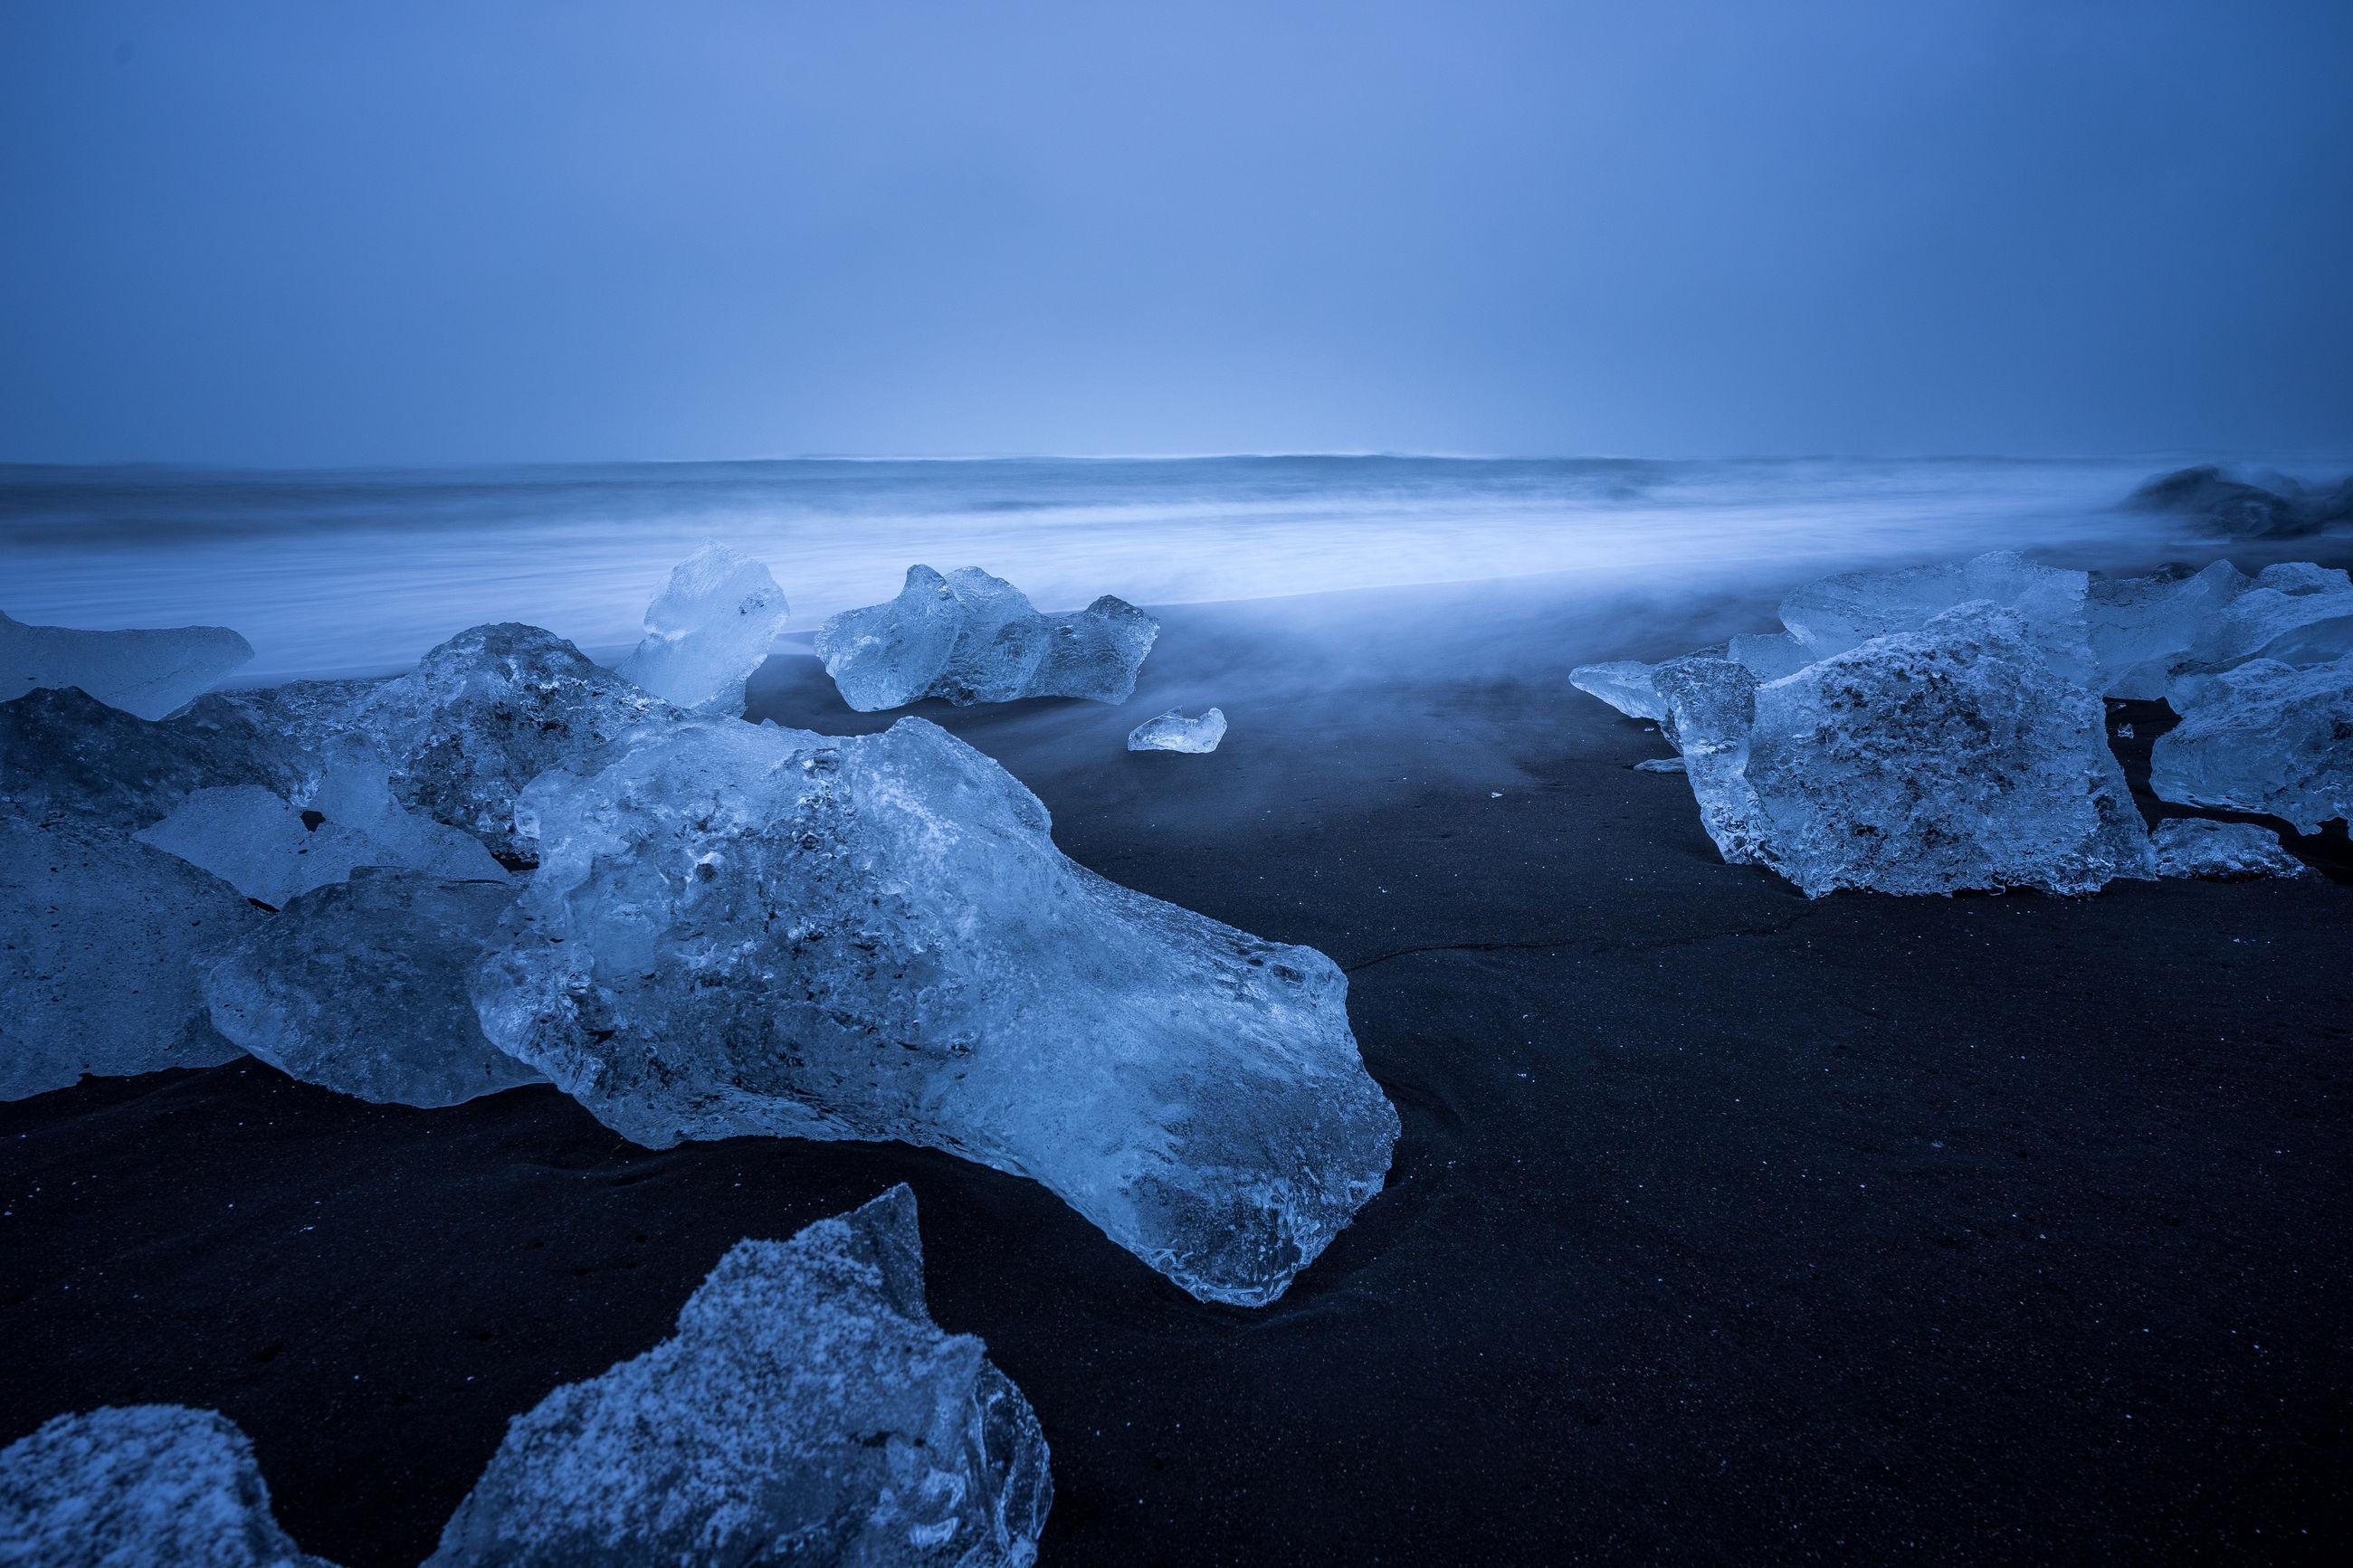 beauty in nature, ice, scenics - nature, frozen, sky, cold temperature, winter, water, glacier, nature, tranquility, sea, tranquil scene, environment, rock, no people, non-urban scene, snow, outdoors, iceberg